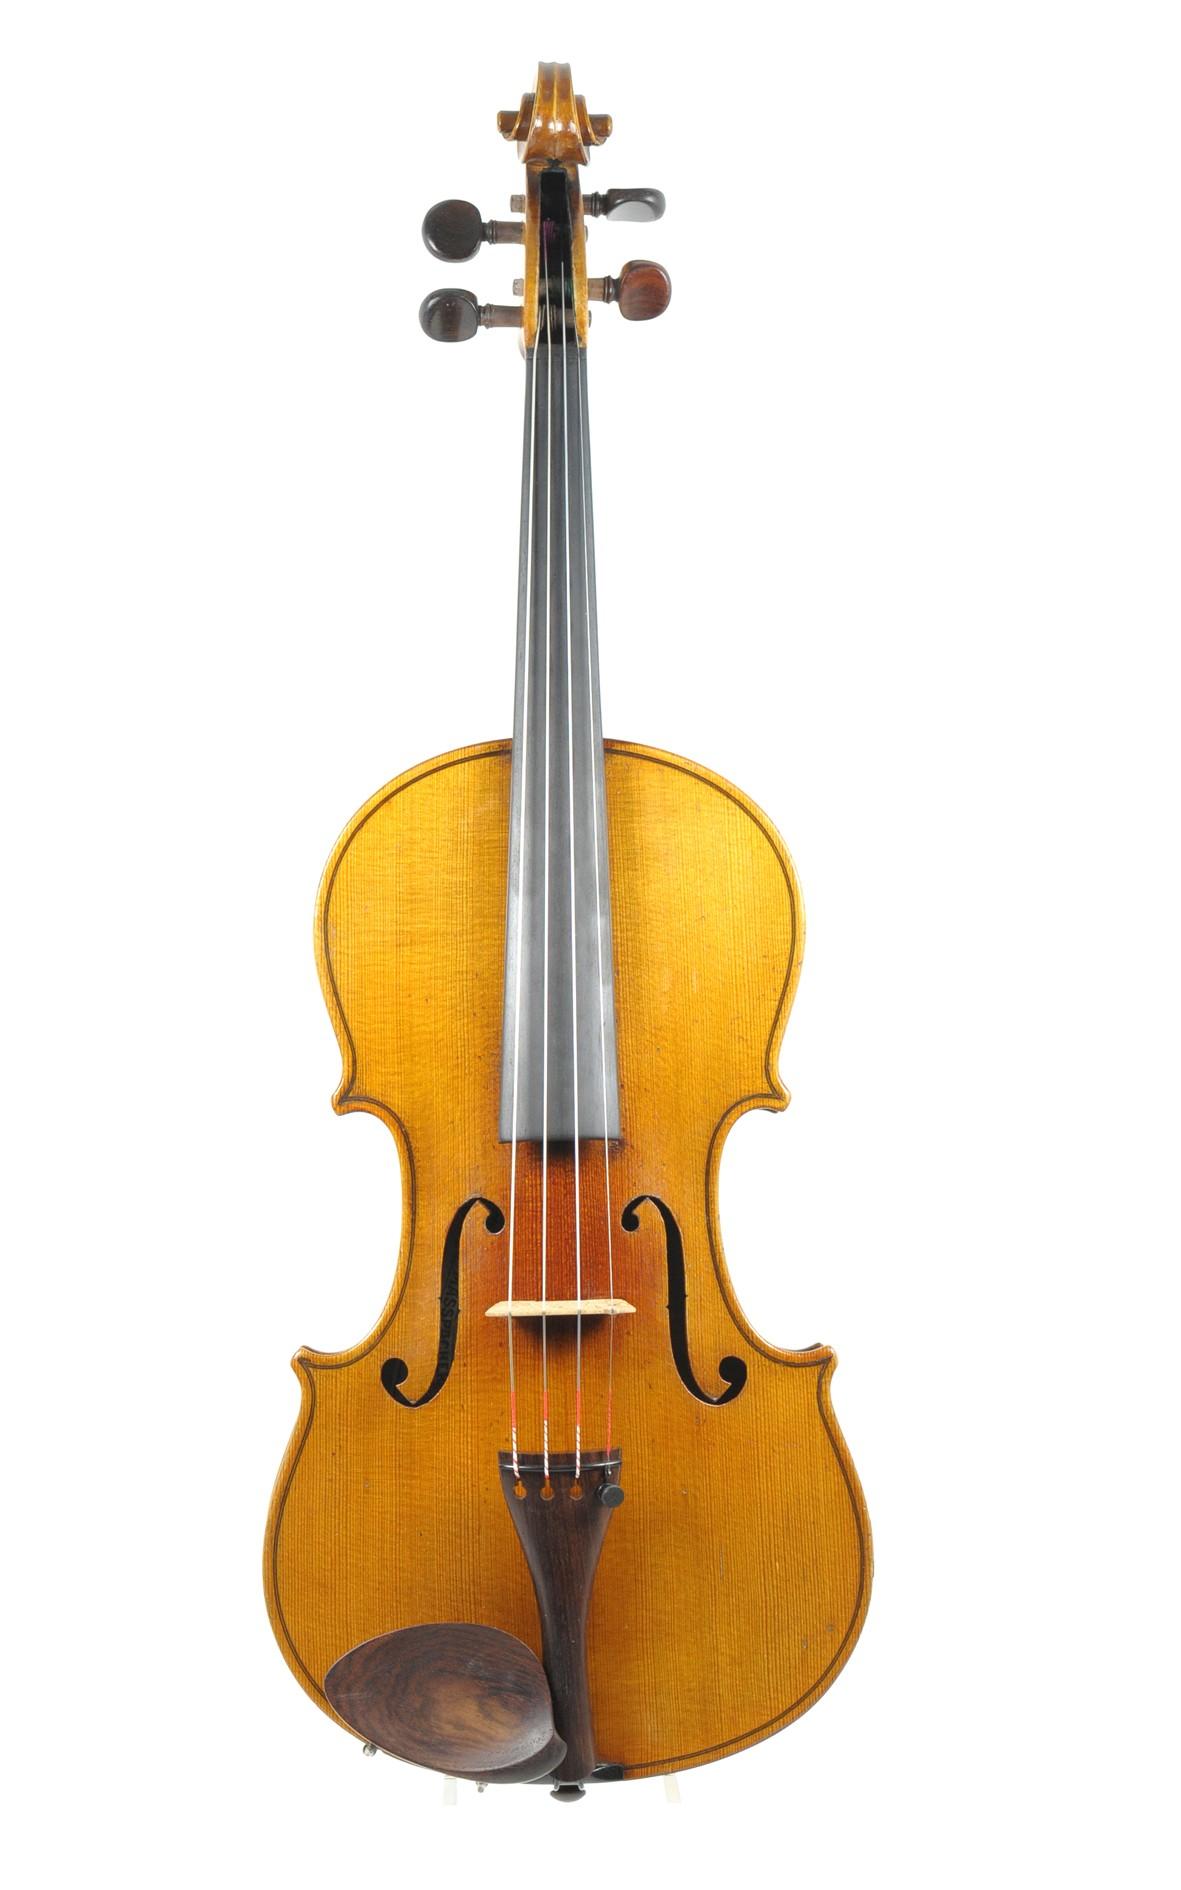 Lutherie Masspacher, French violin from Mirecourt - ????